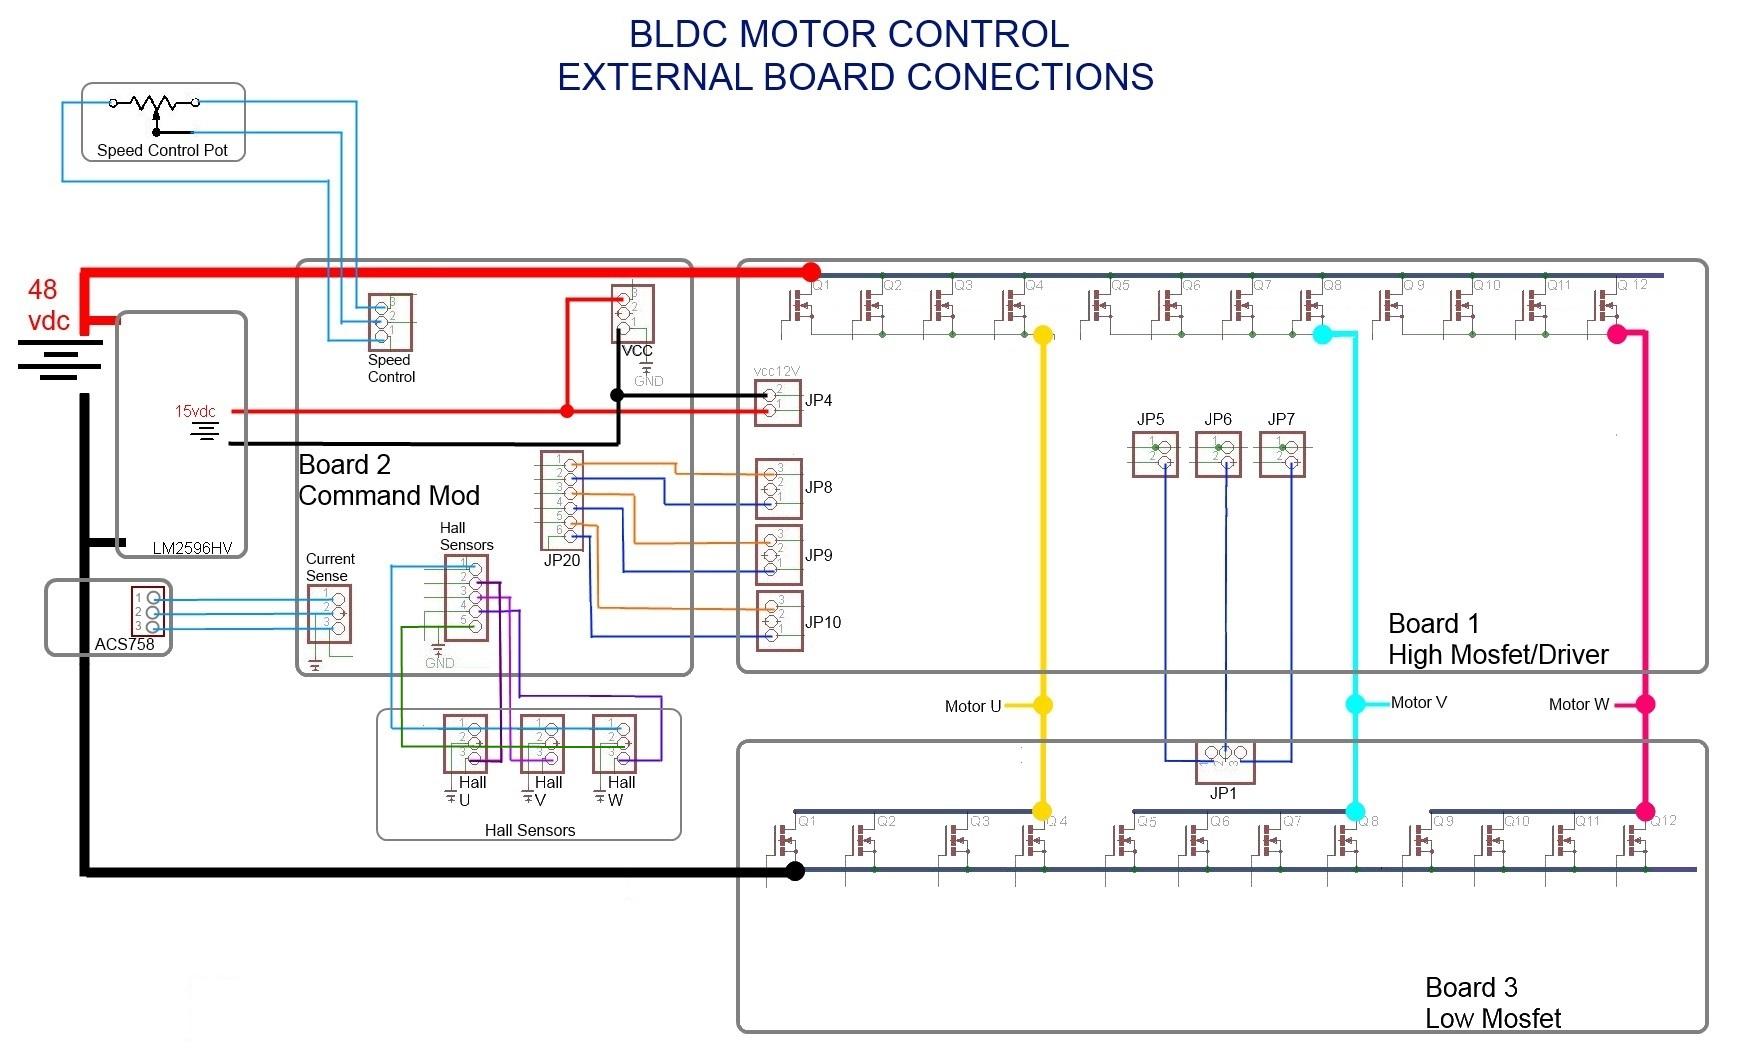 bldcmotorcontrol 171 brushless motors 3phase inverters schematics